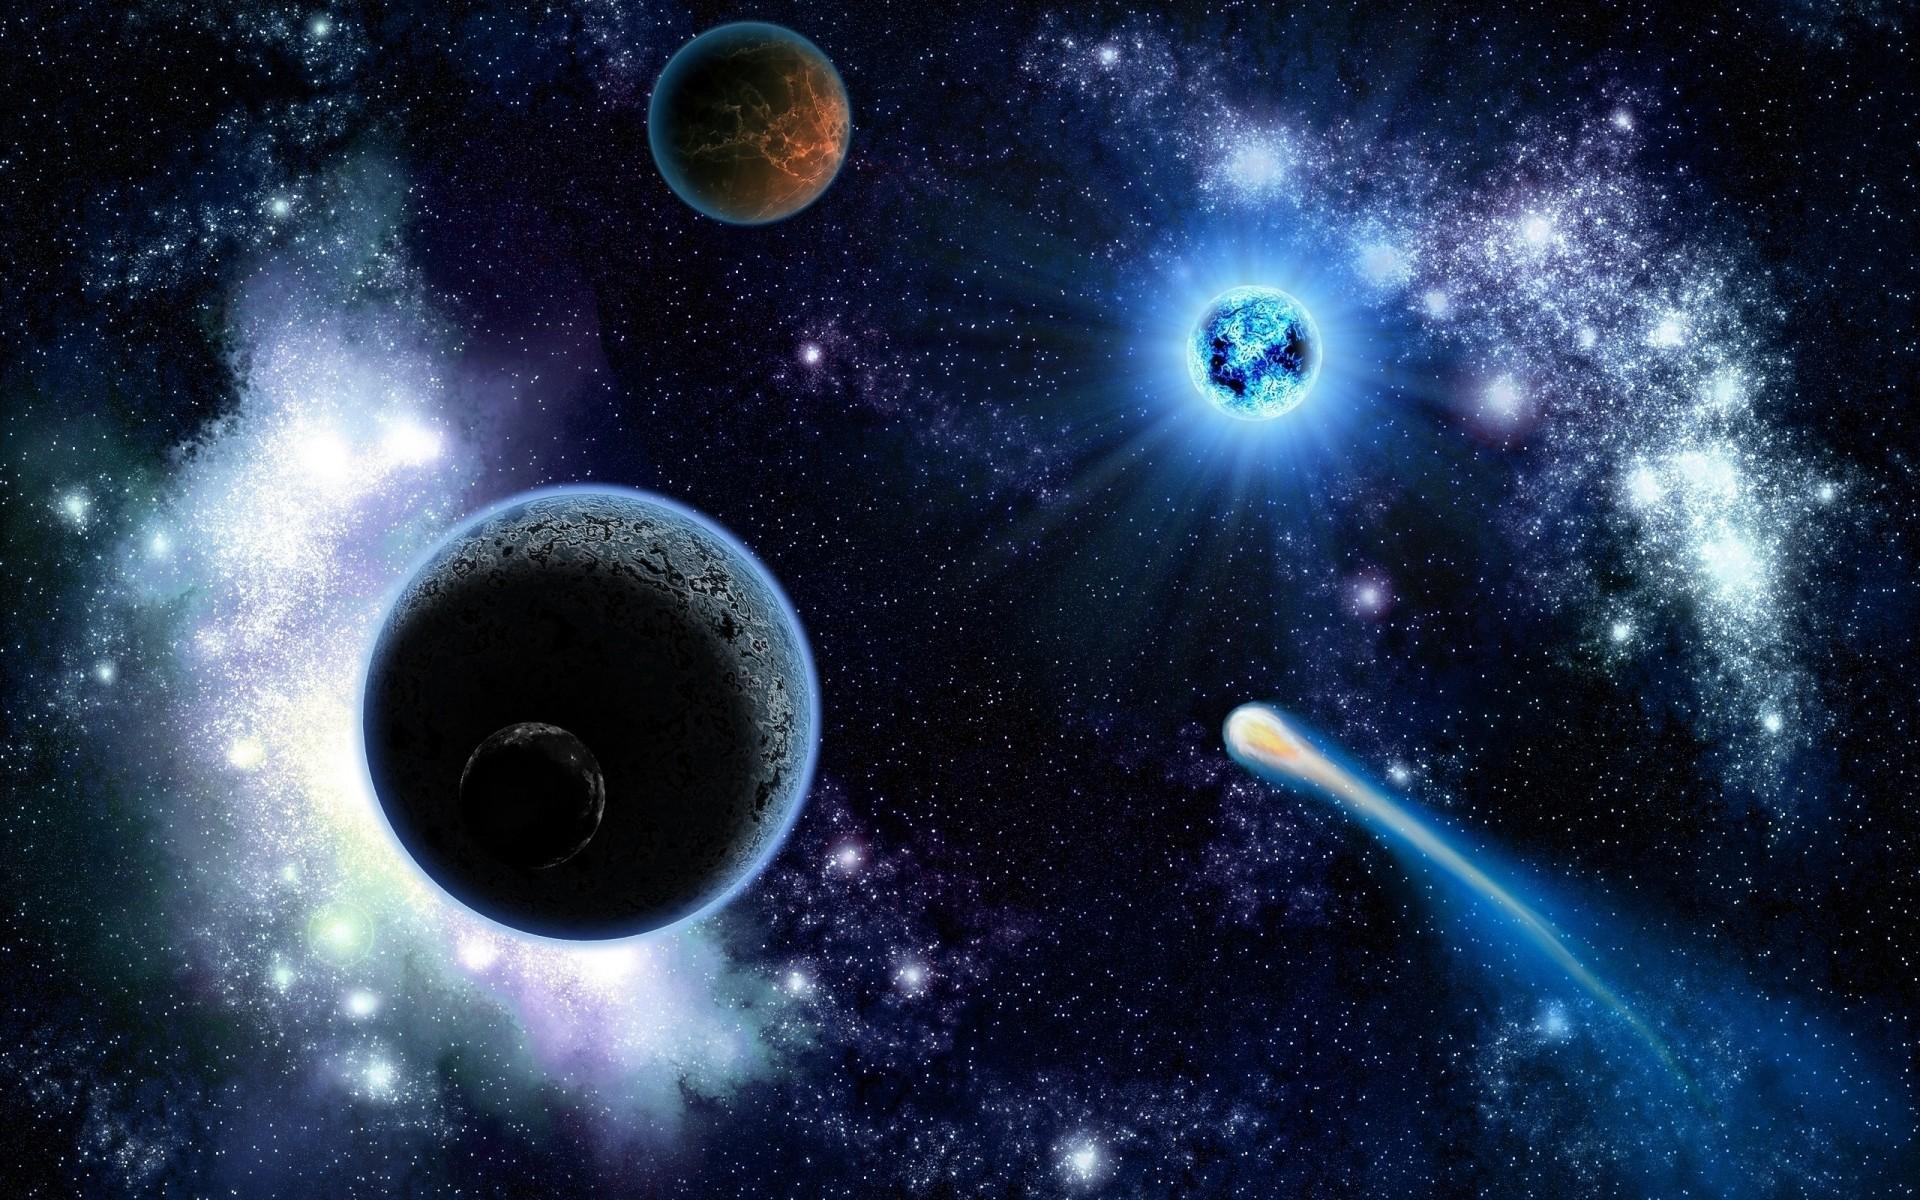 Картинки на тему космоса